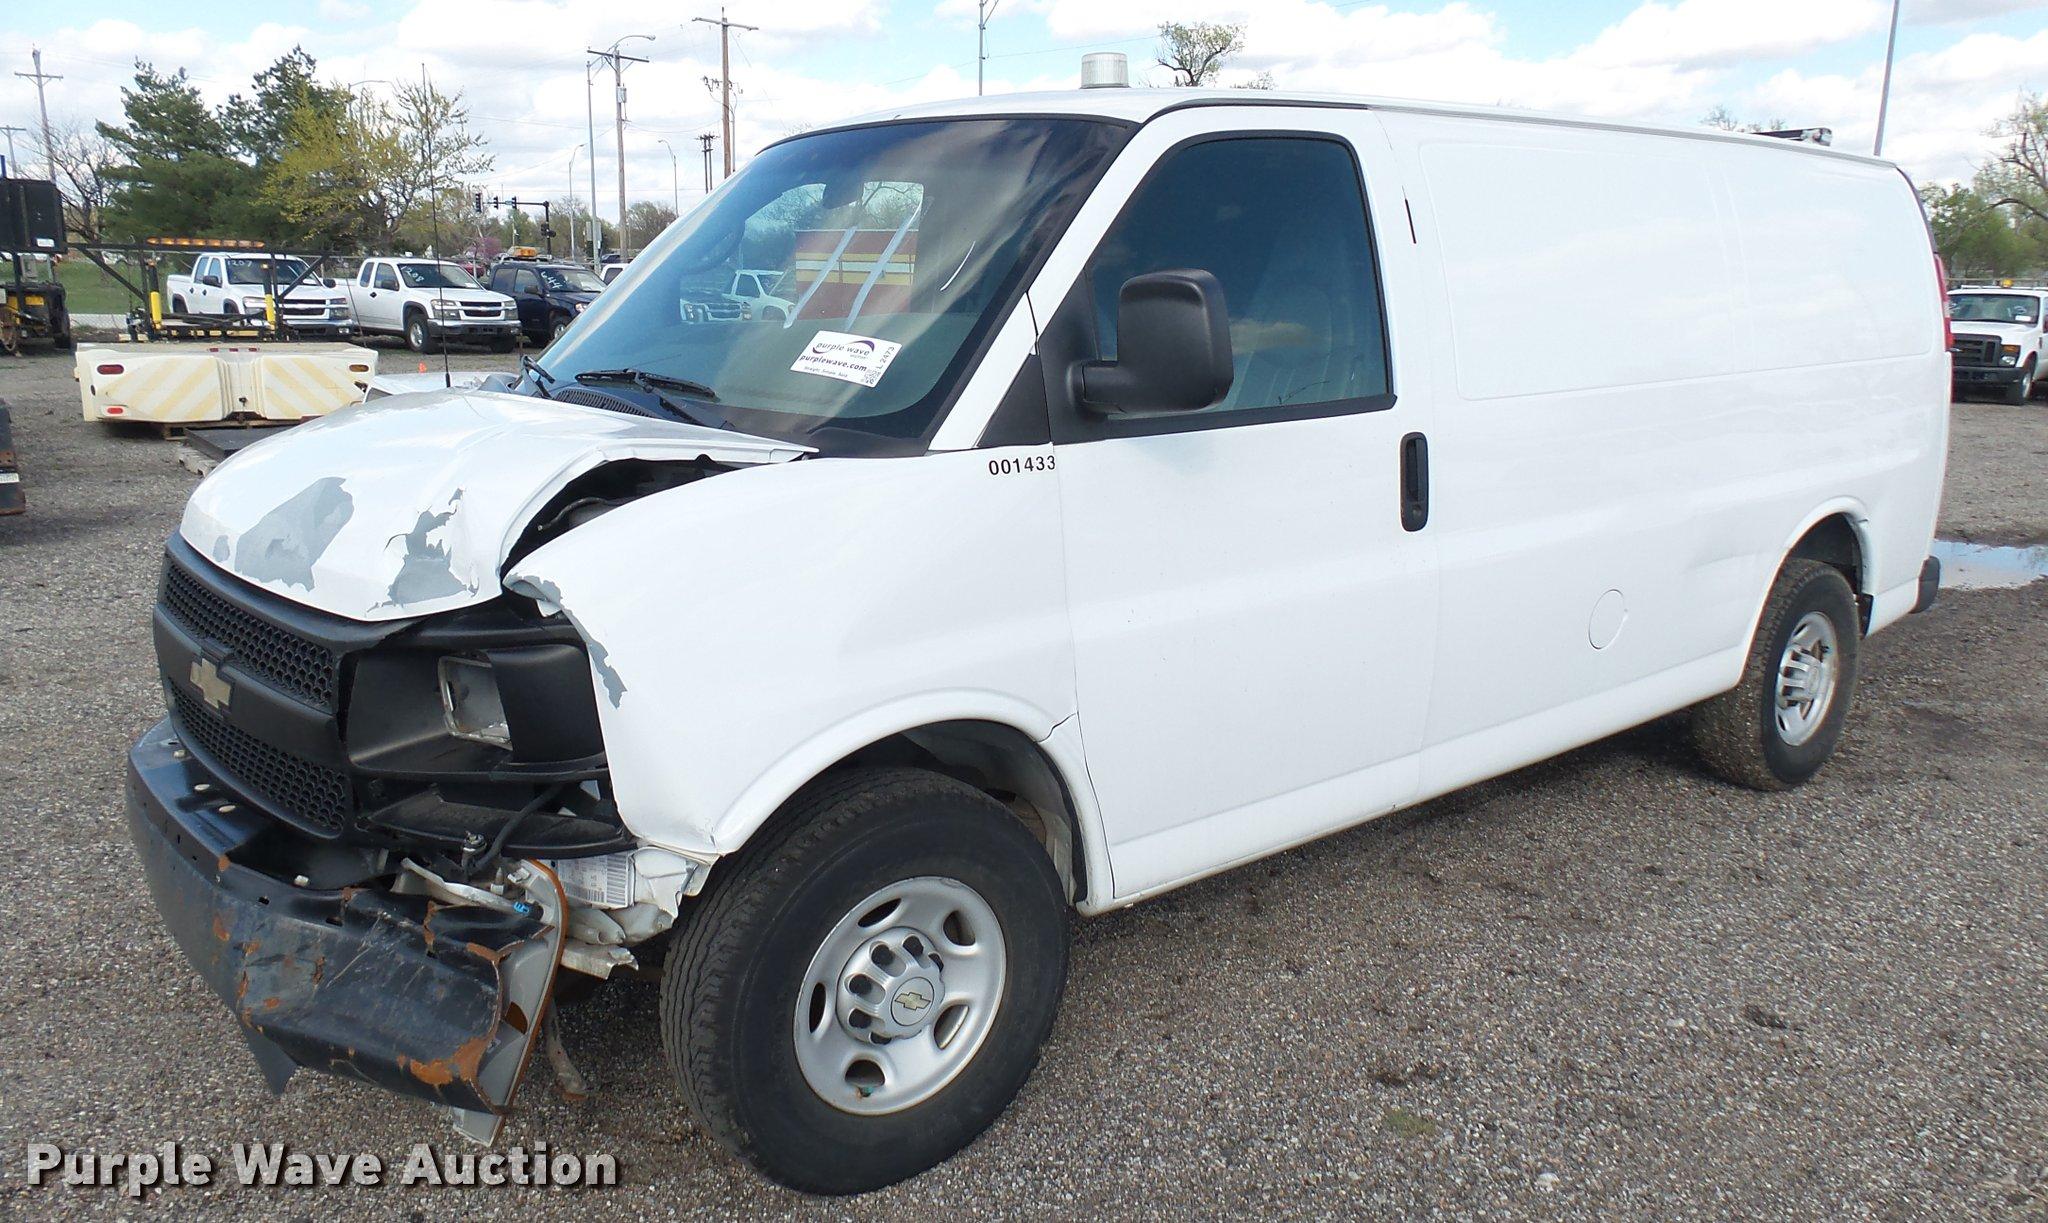 2007 Chevrolet Express 2500 Cargo Van In Wichita Ks Item L2473 Sold Purple Wave